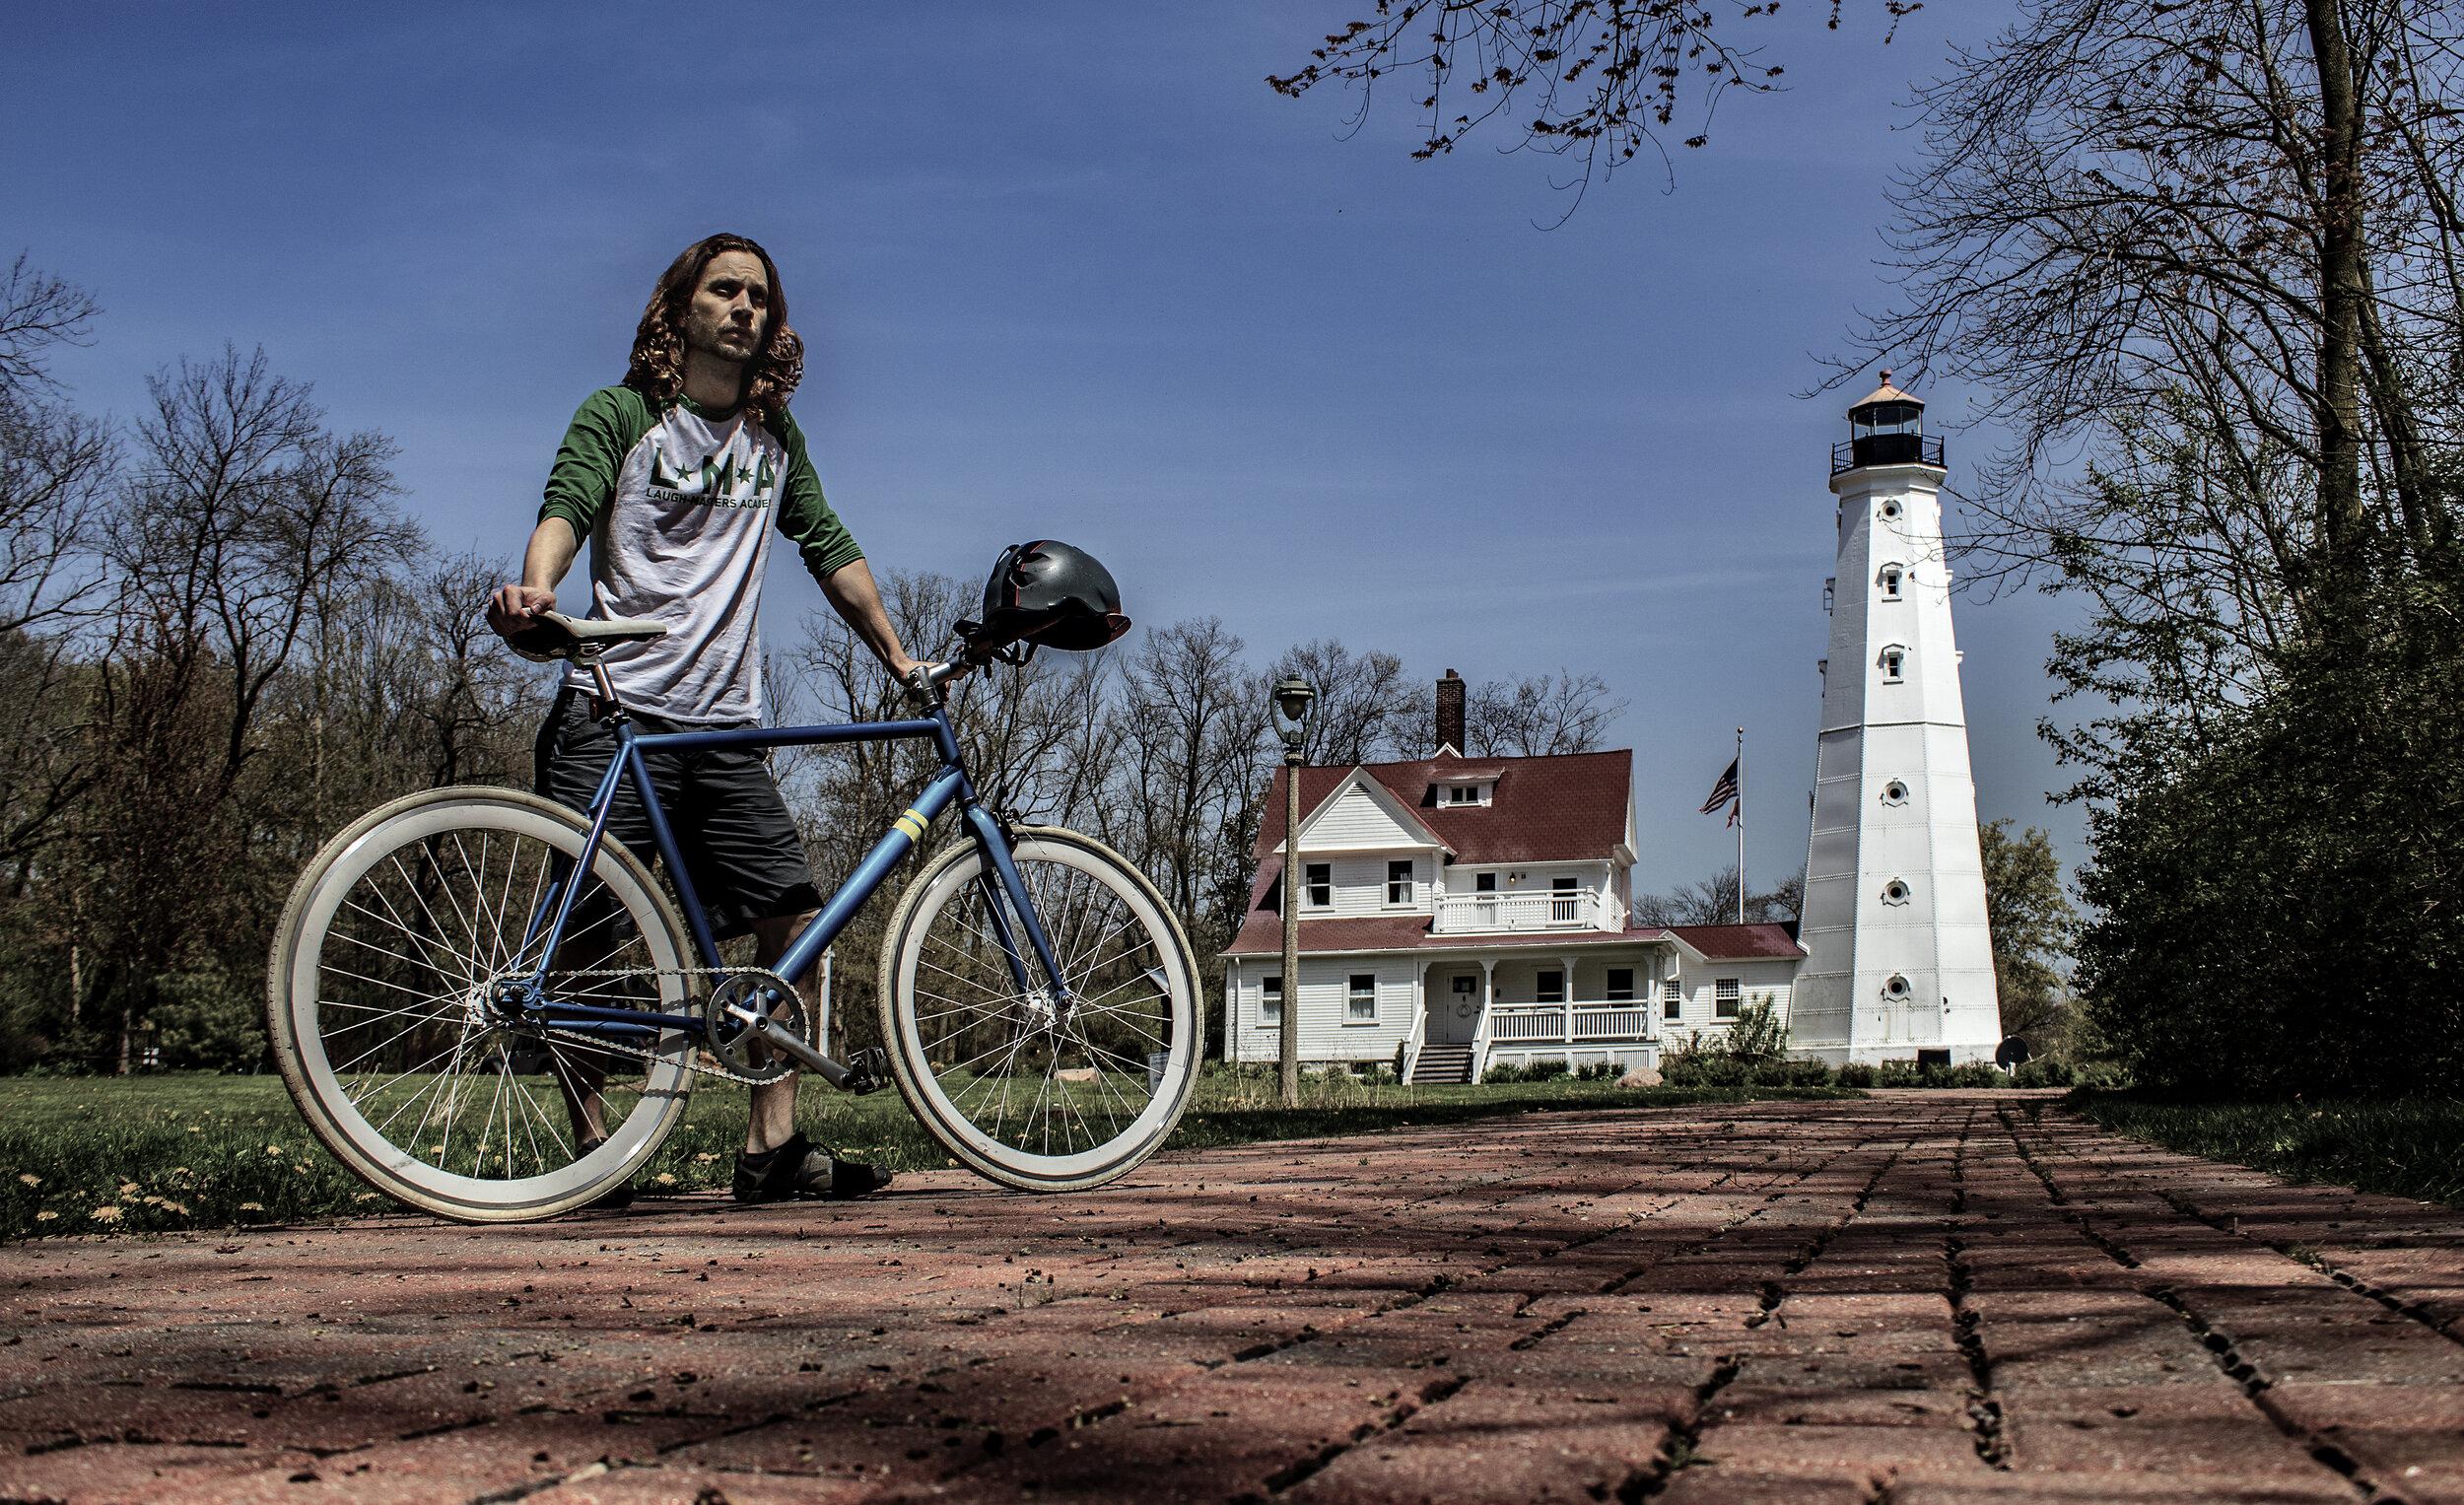 Milwaukee_Lake Park_North Point Light Tower_Wandering Badger_Sole Bike_011_20190522_IMG_6019.jpg